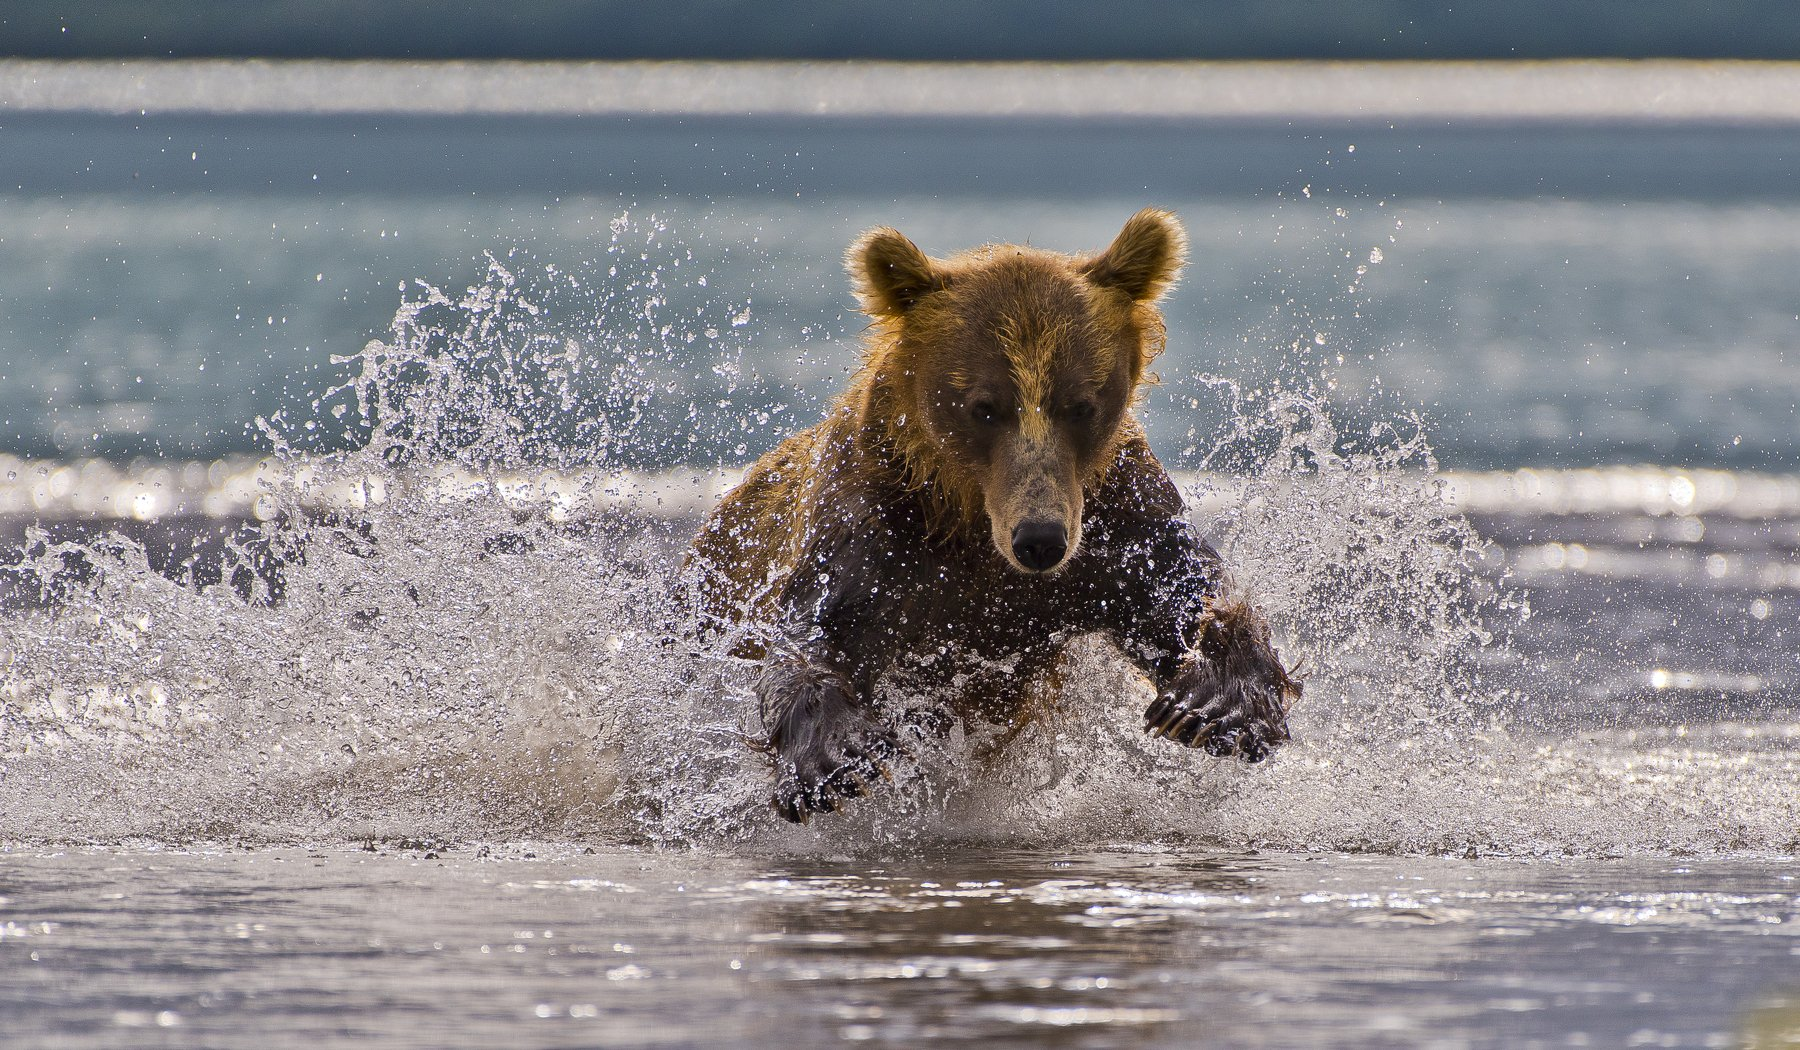 Bear Animal Mammal Salmon Kuril Lake Russia Kamchatka fishing, Barbarini Paolo